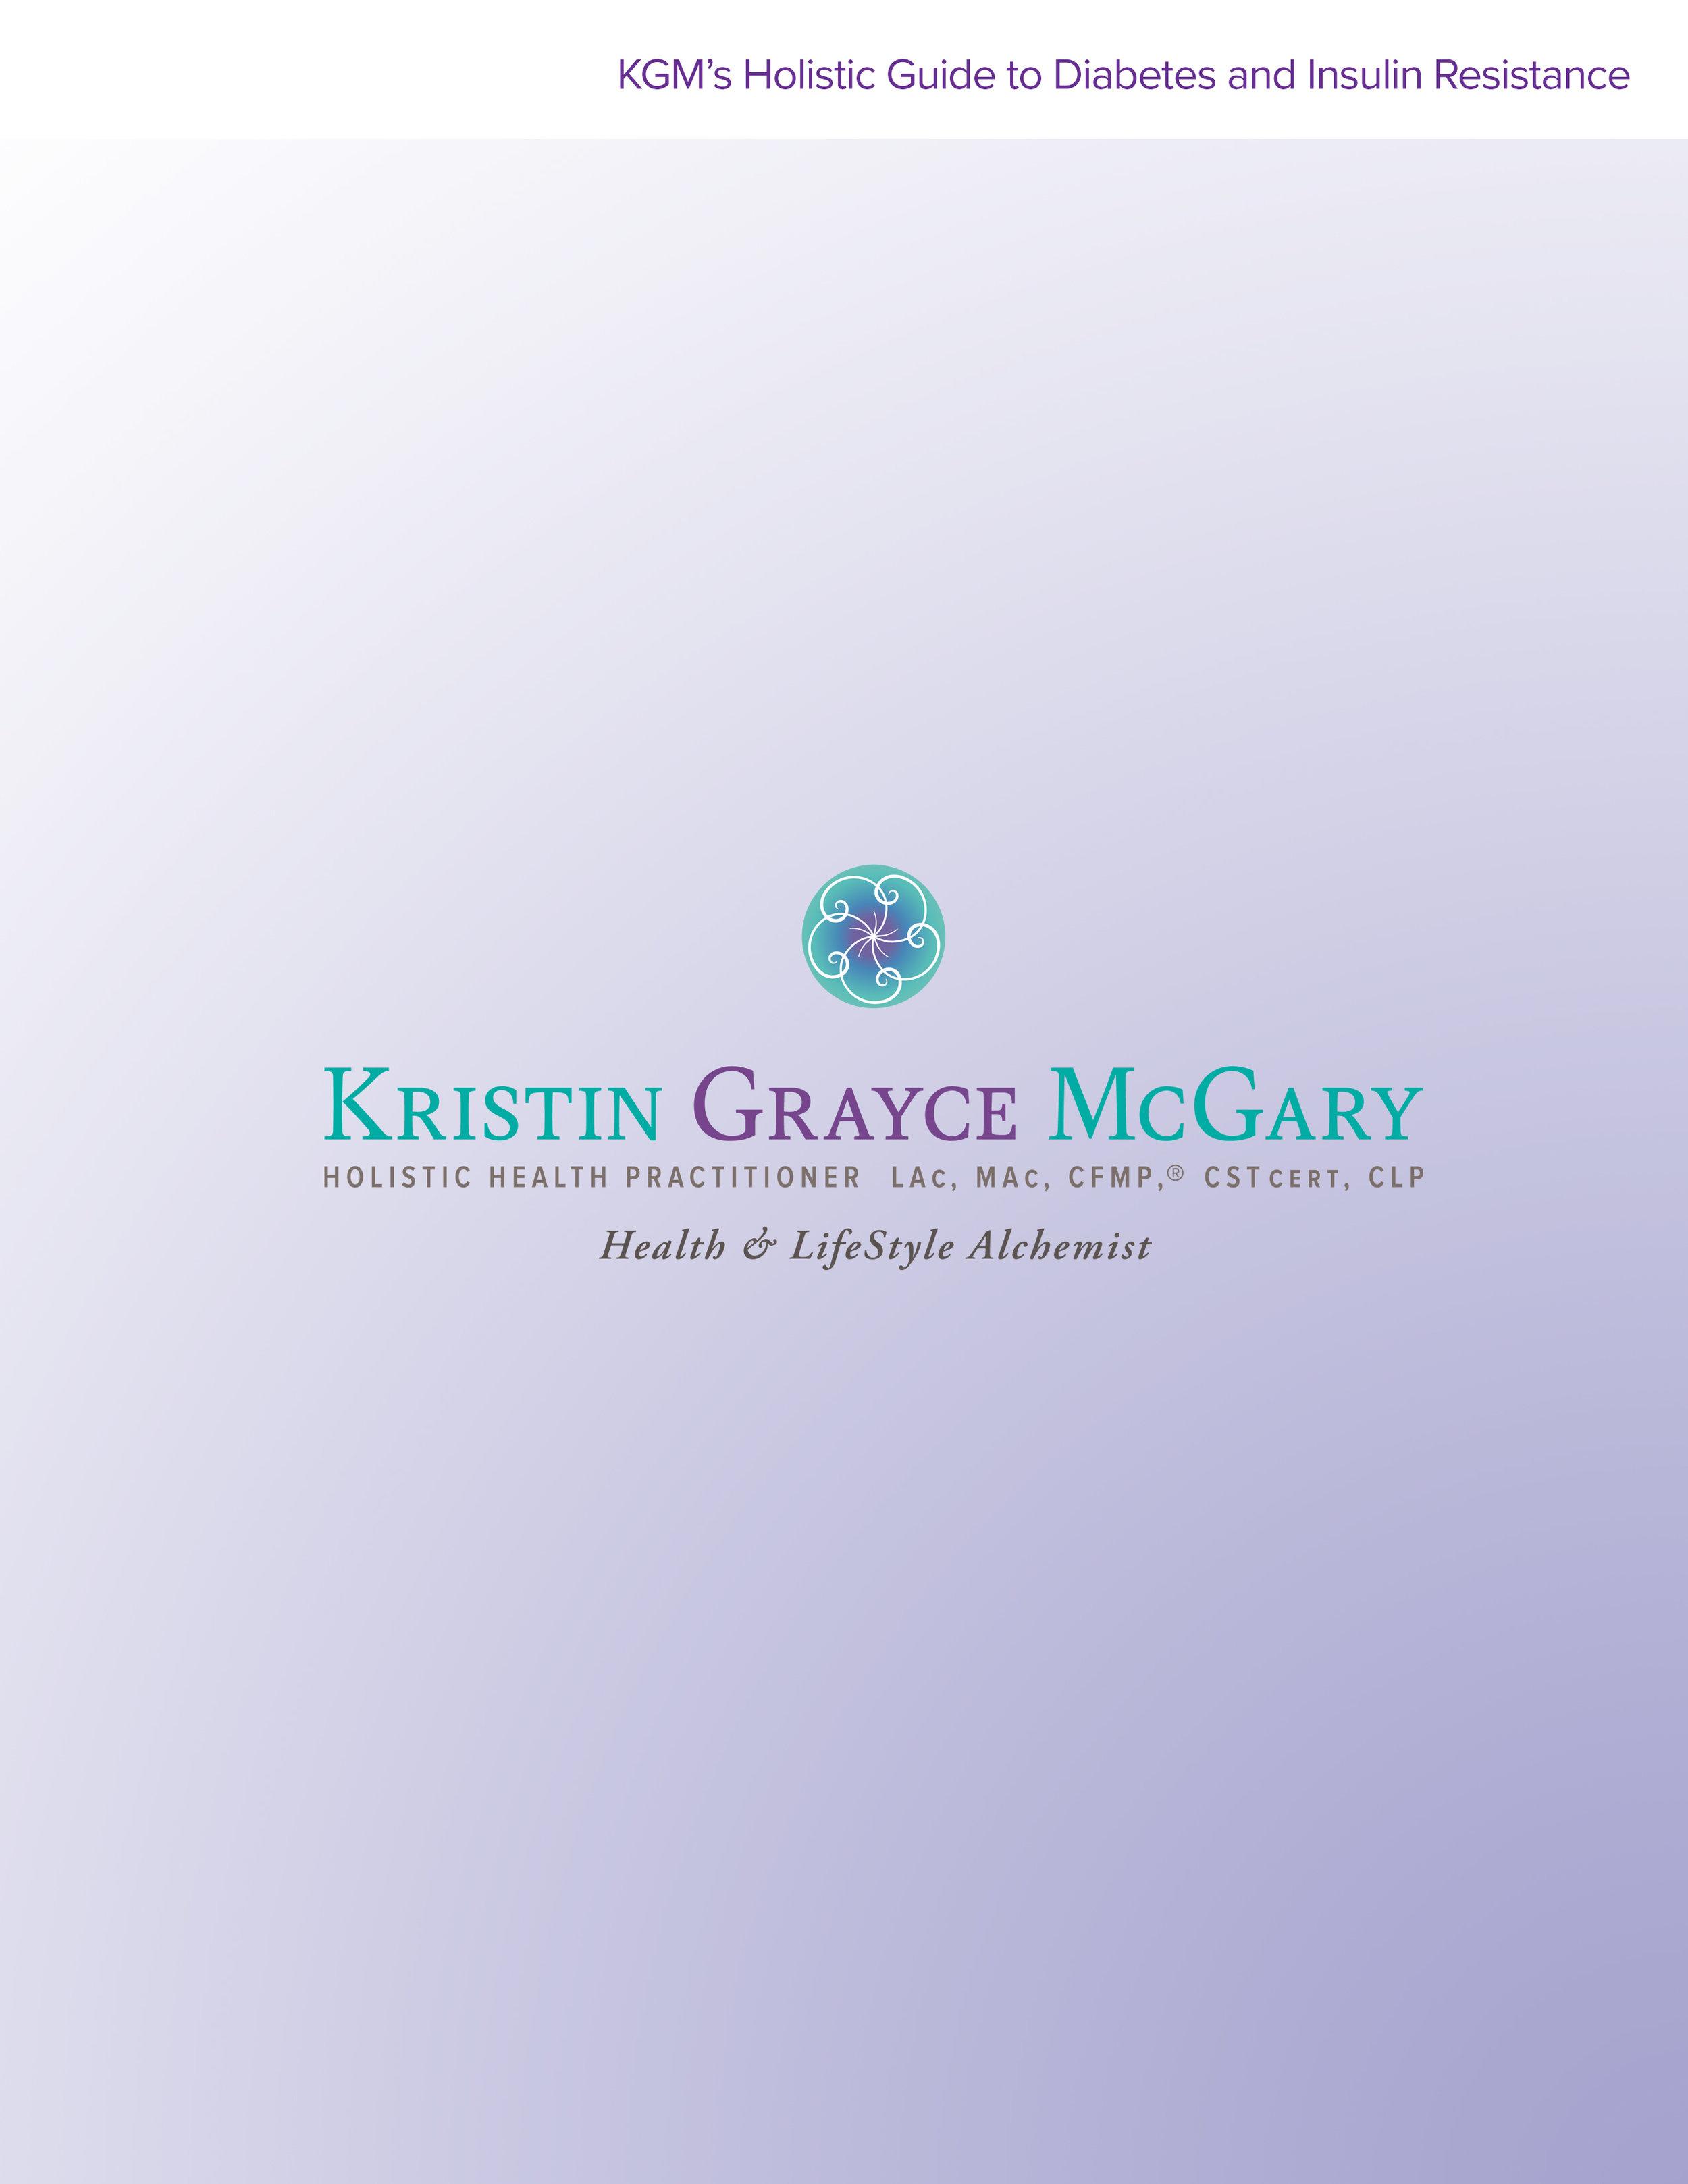 KGM_Insulin_Page00.jpg